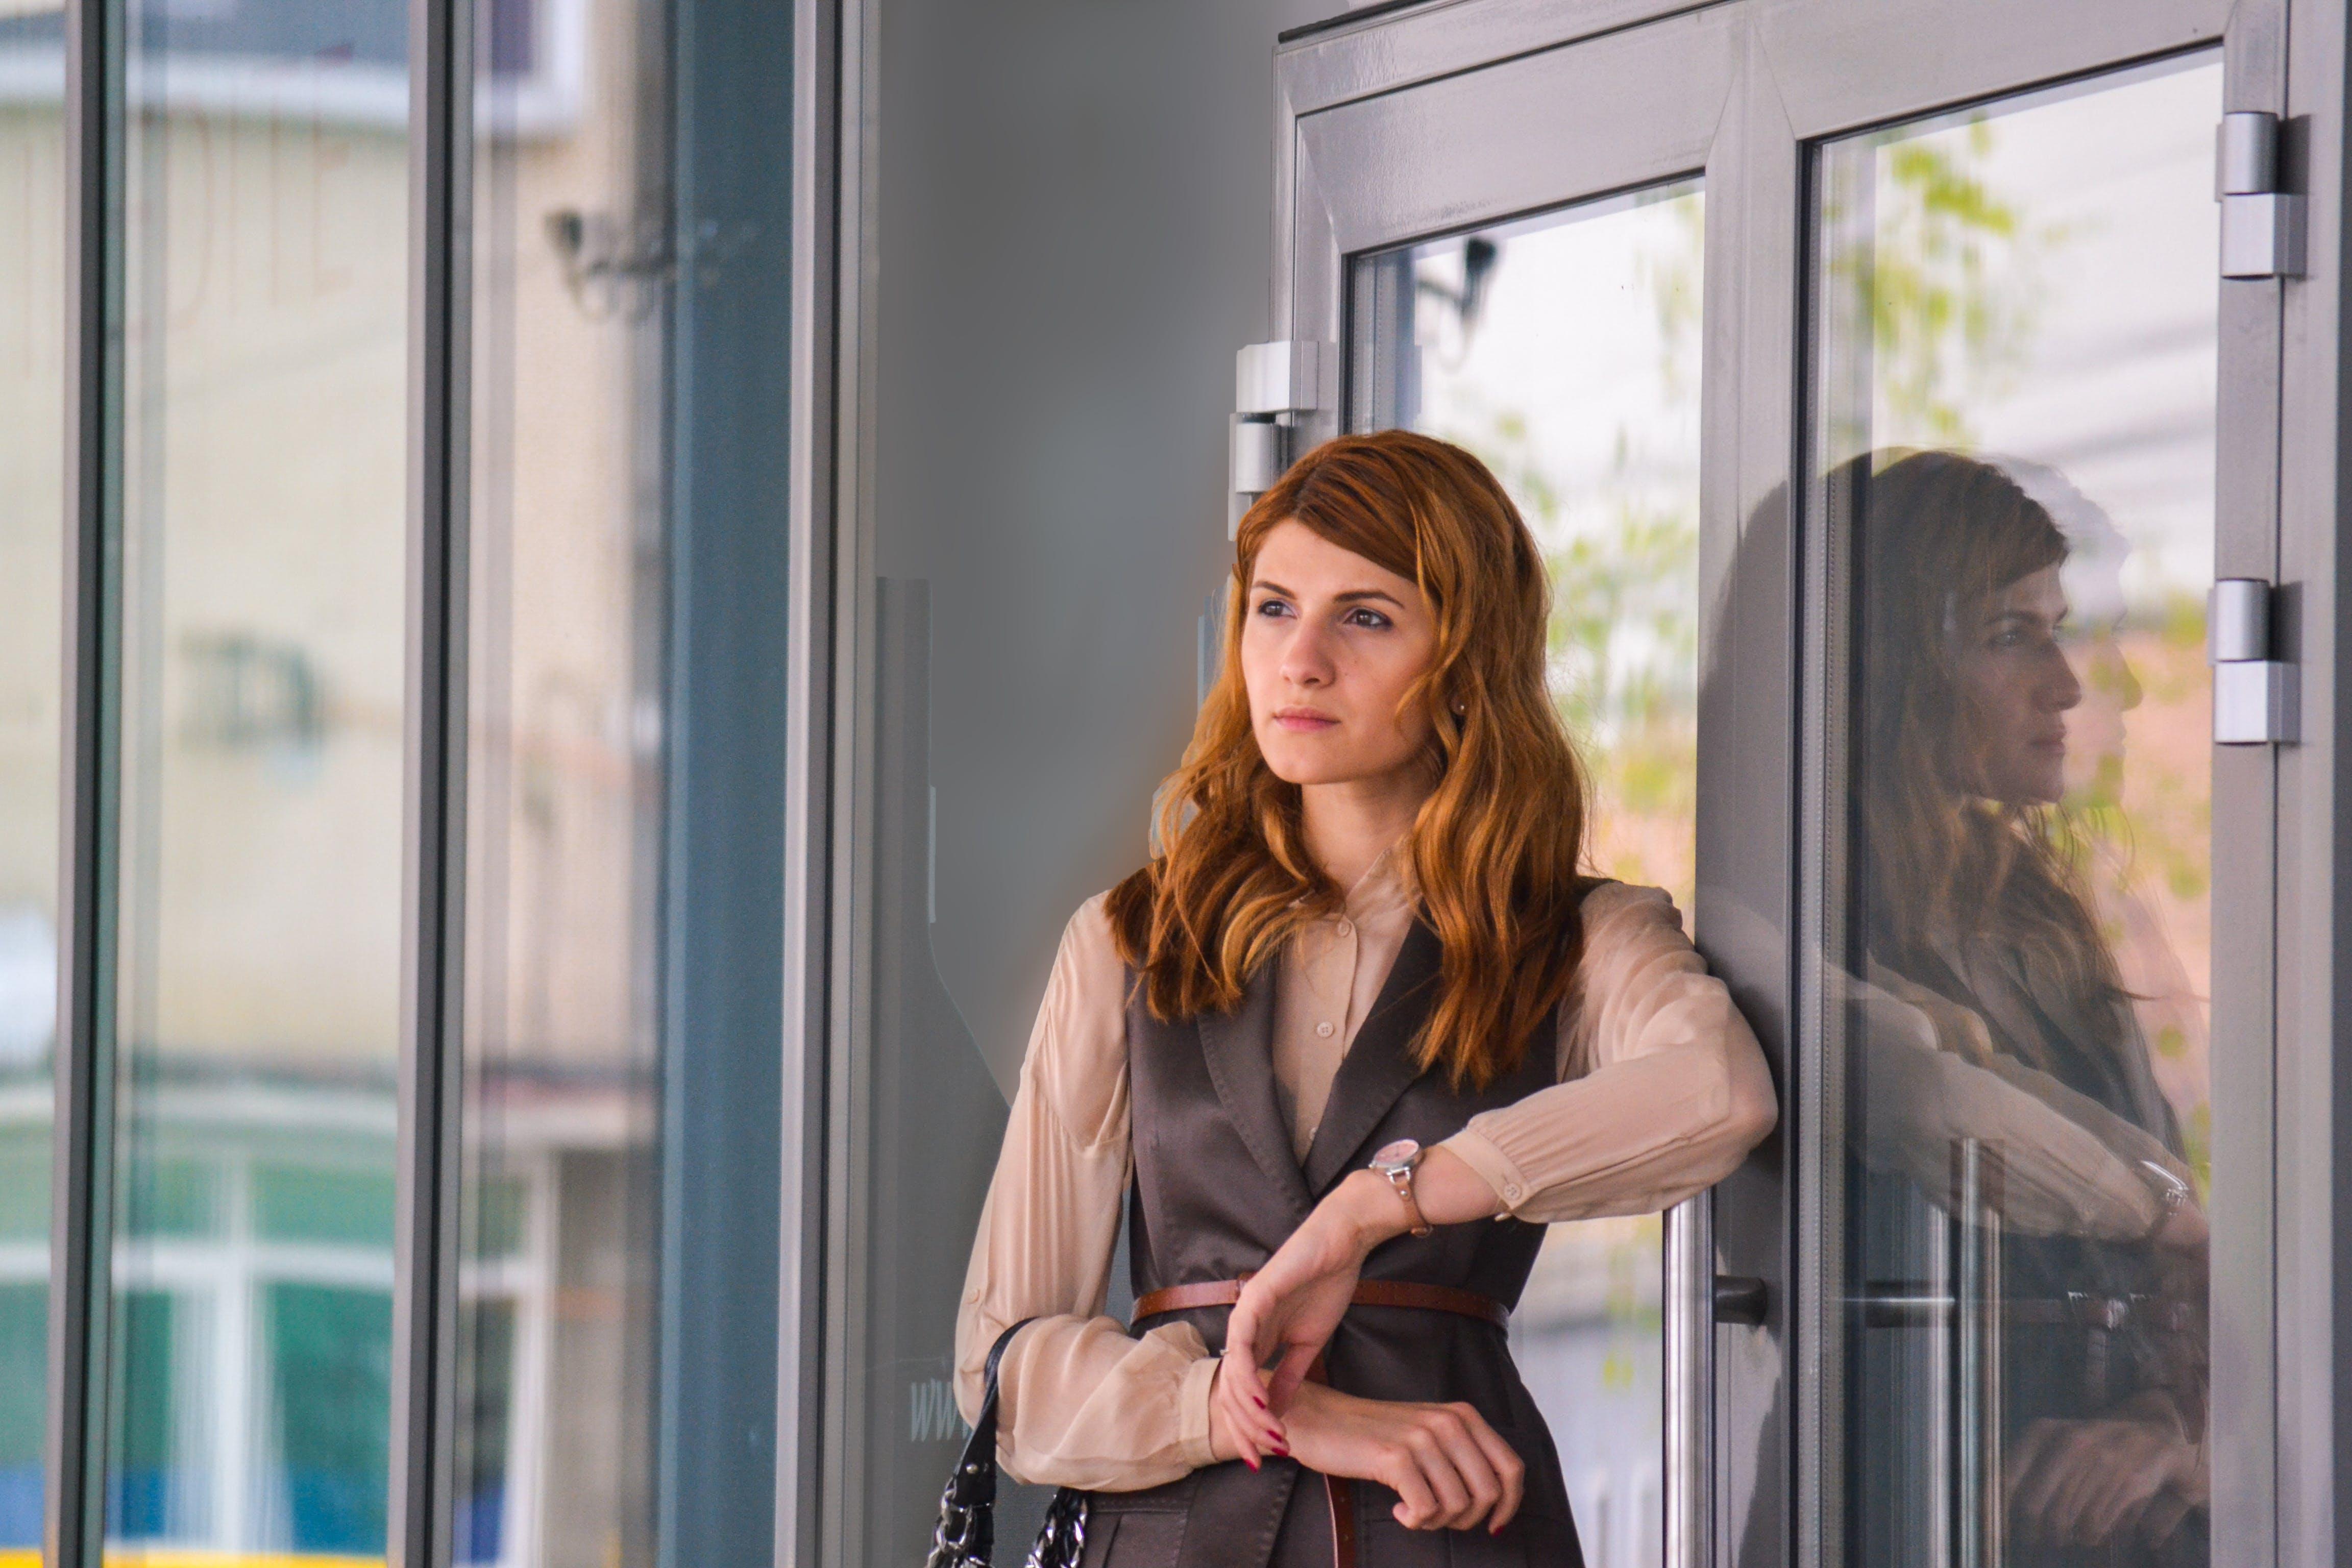 Woman Standing Near Clear Glass Gray Framed Door Panel